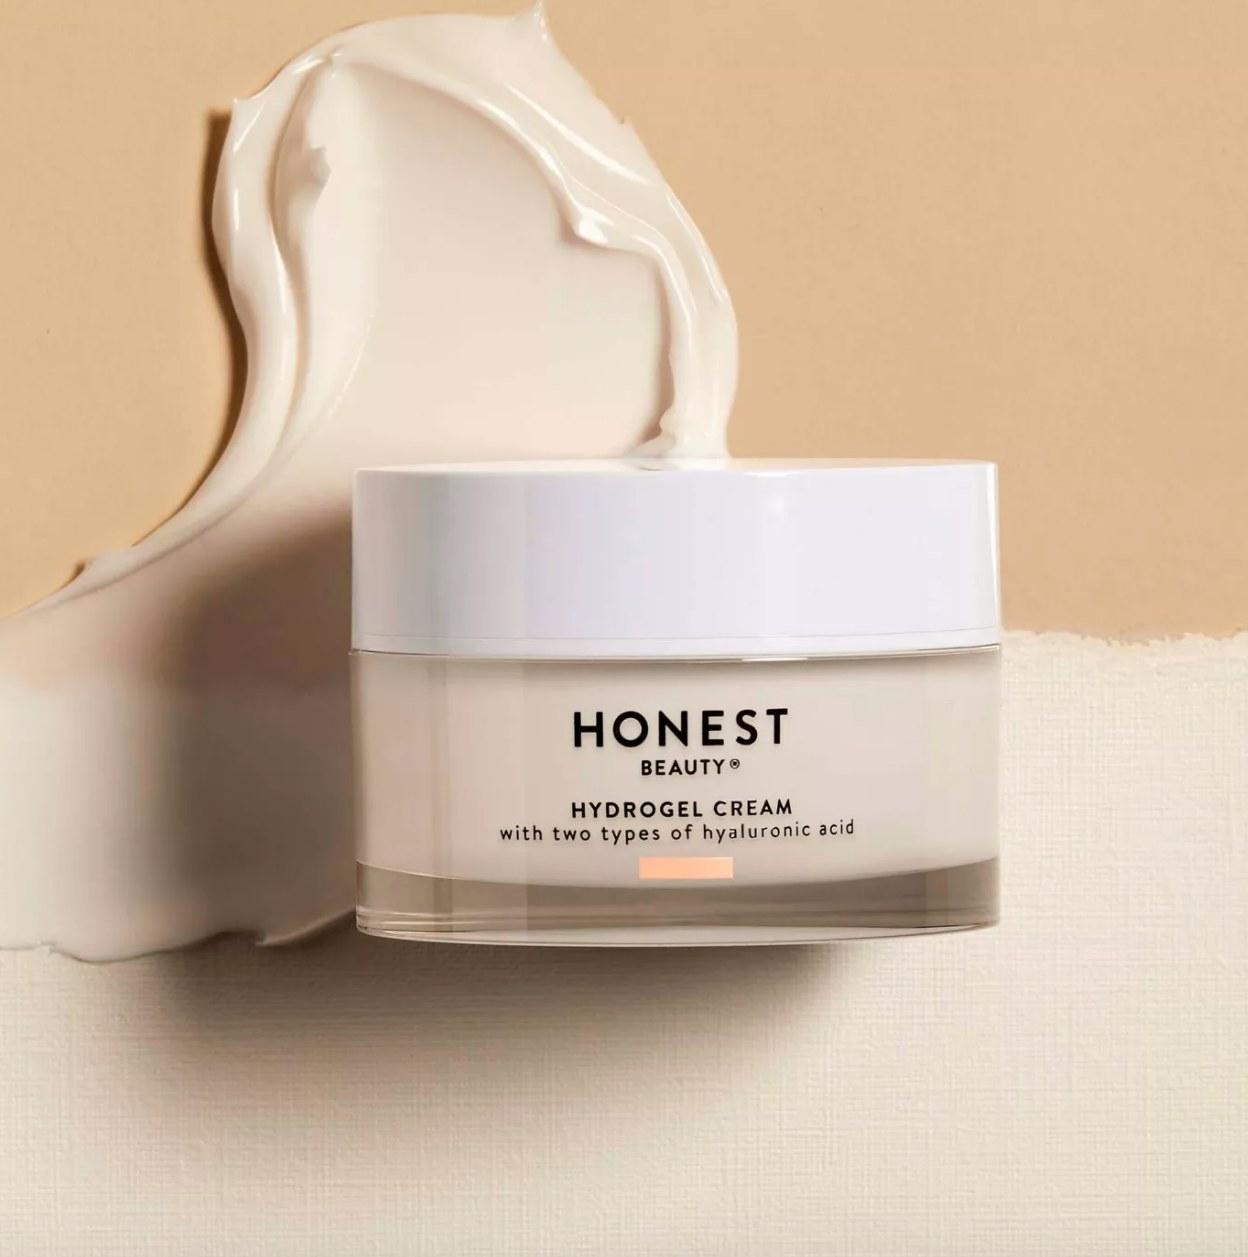 Honest Beauty moisturizer against cream background